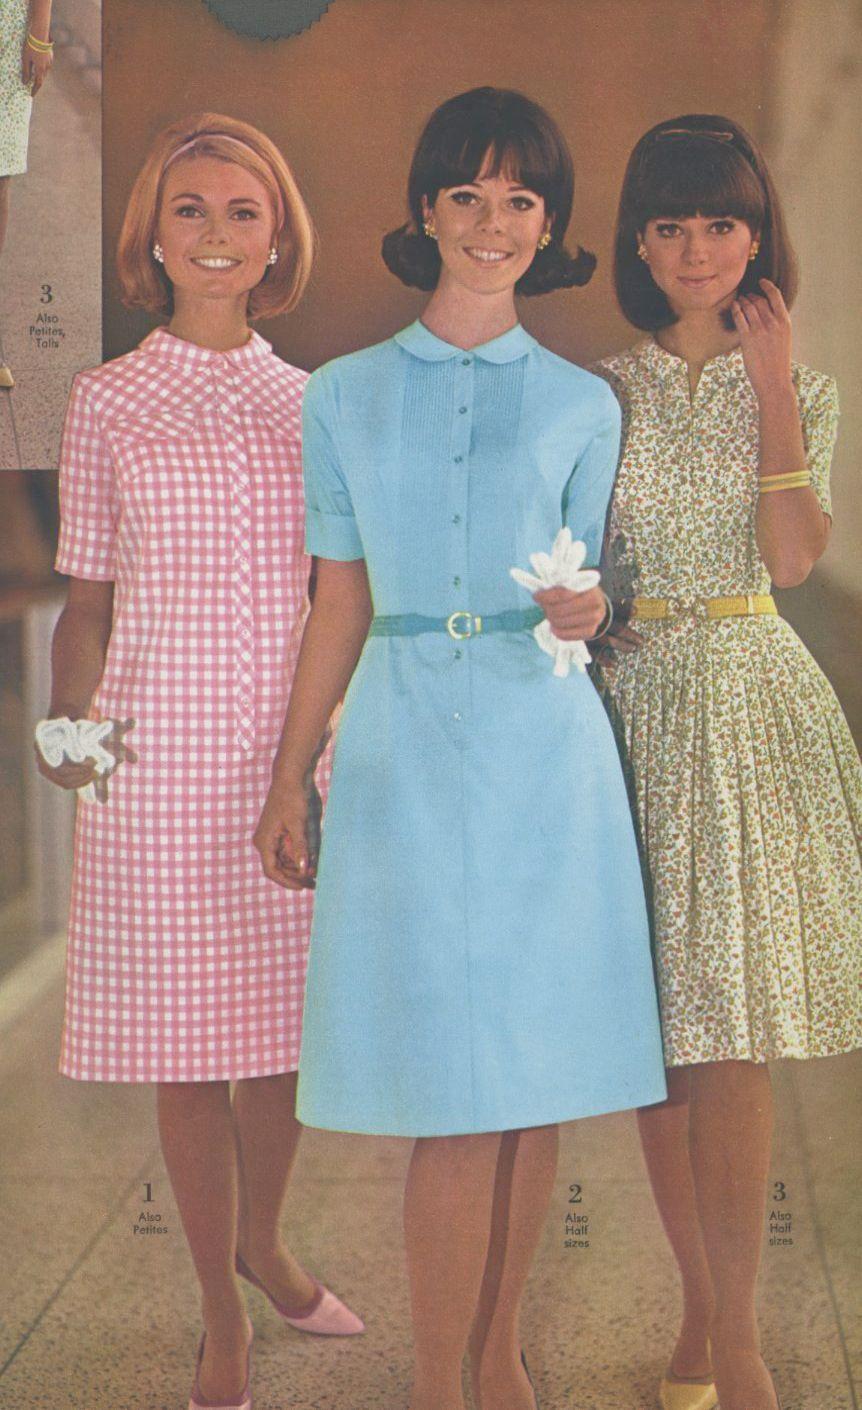 Fashion Show Dress Fall Down Videos Out Ella Dress Fashion Nova Fashion Nova Ombre Dress Sixties Fashion Summer Fashion Dresses 1960s Fashion